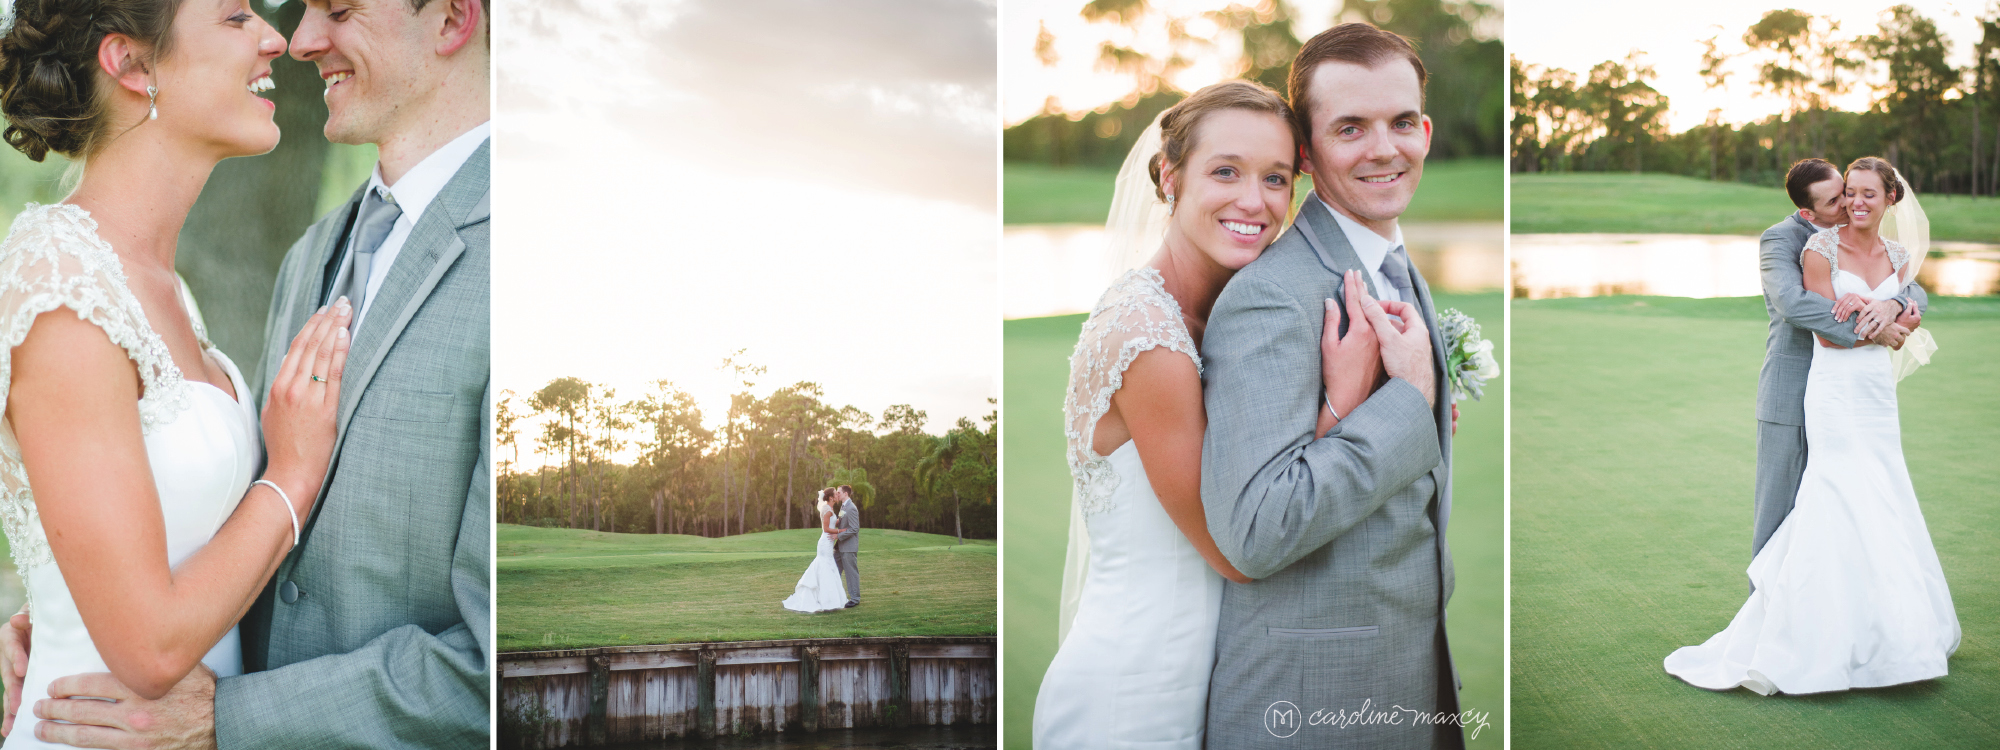 Alecia and Craig's Sebring, FL Wedding with Caroline Maxcy Photography.